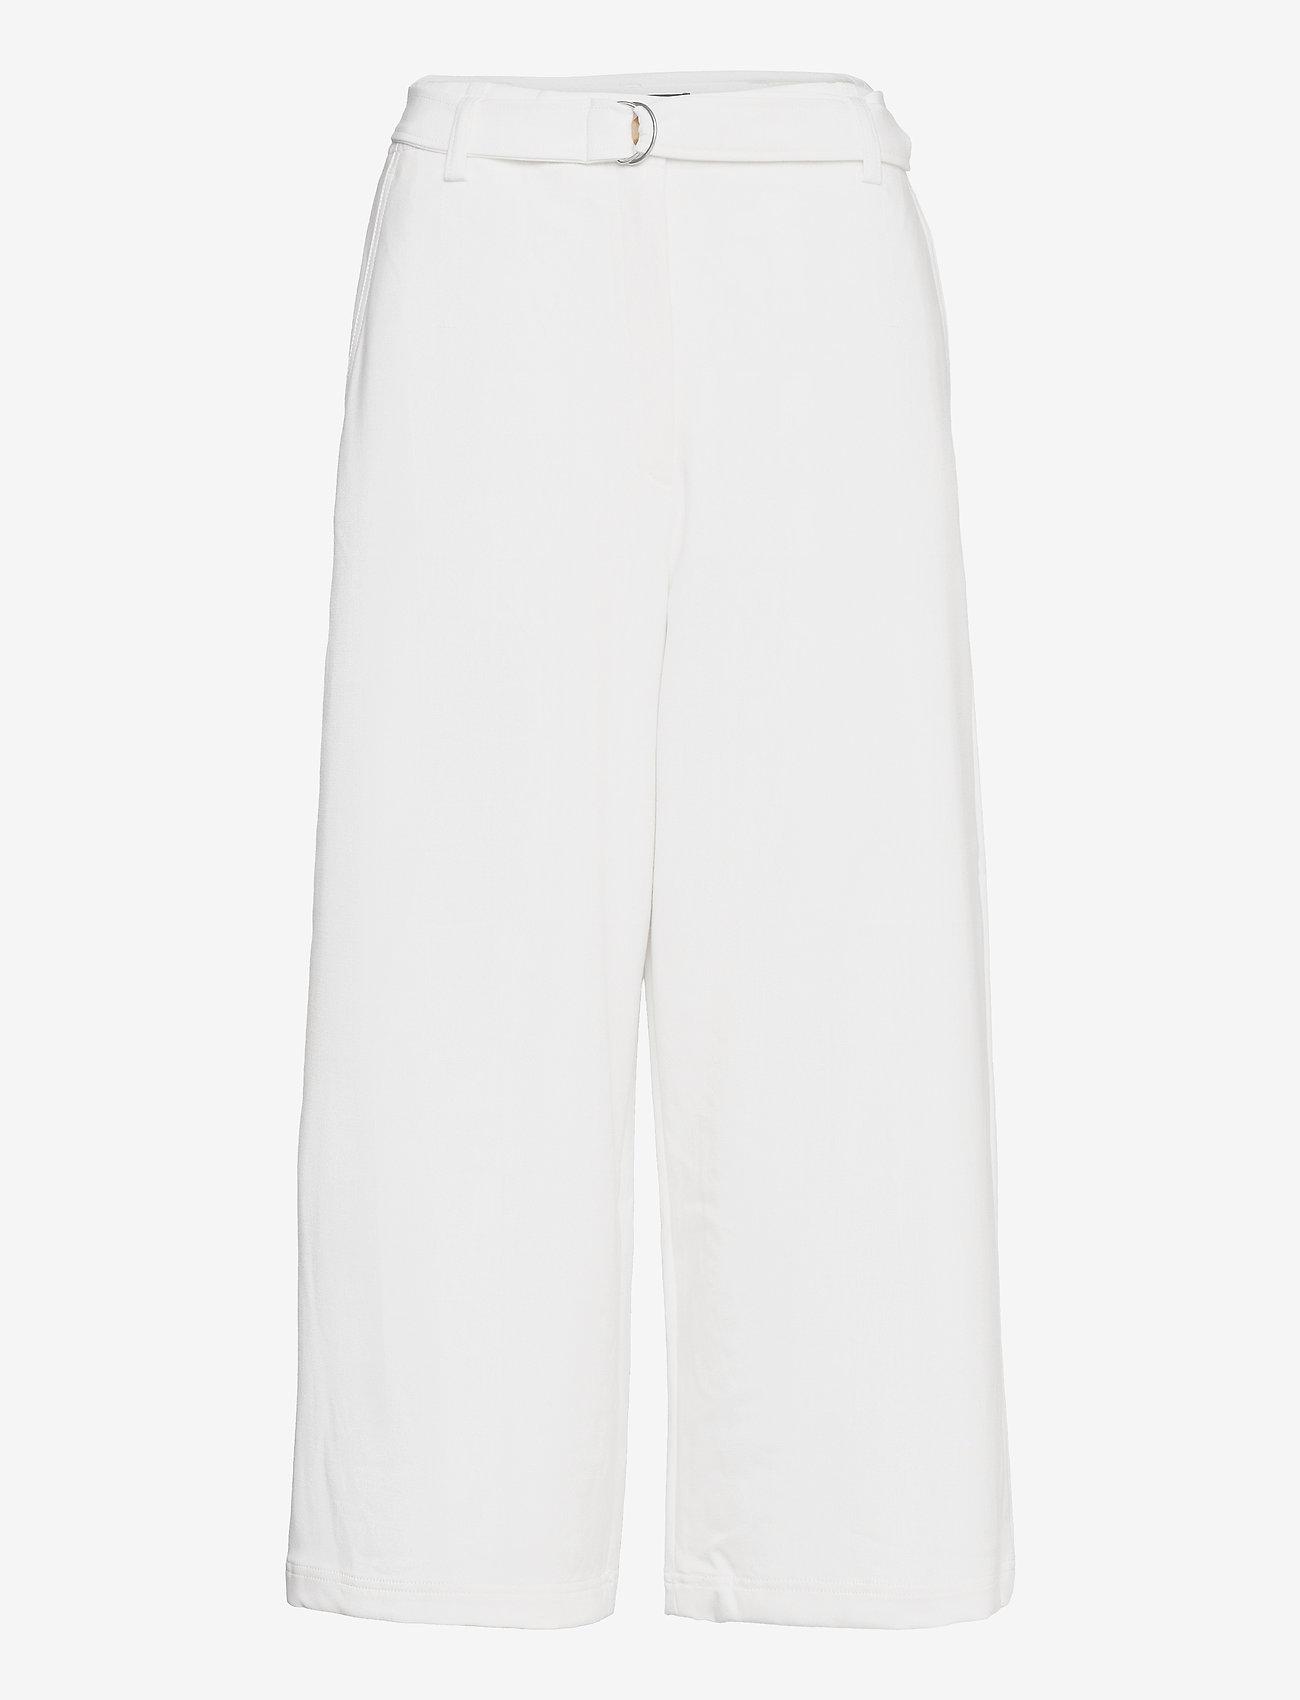 French Connection - INDI WHISPER RUTH STNG CULOTTS - bukser med brede ben - summer white - 0